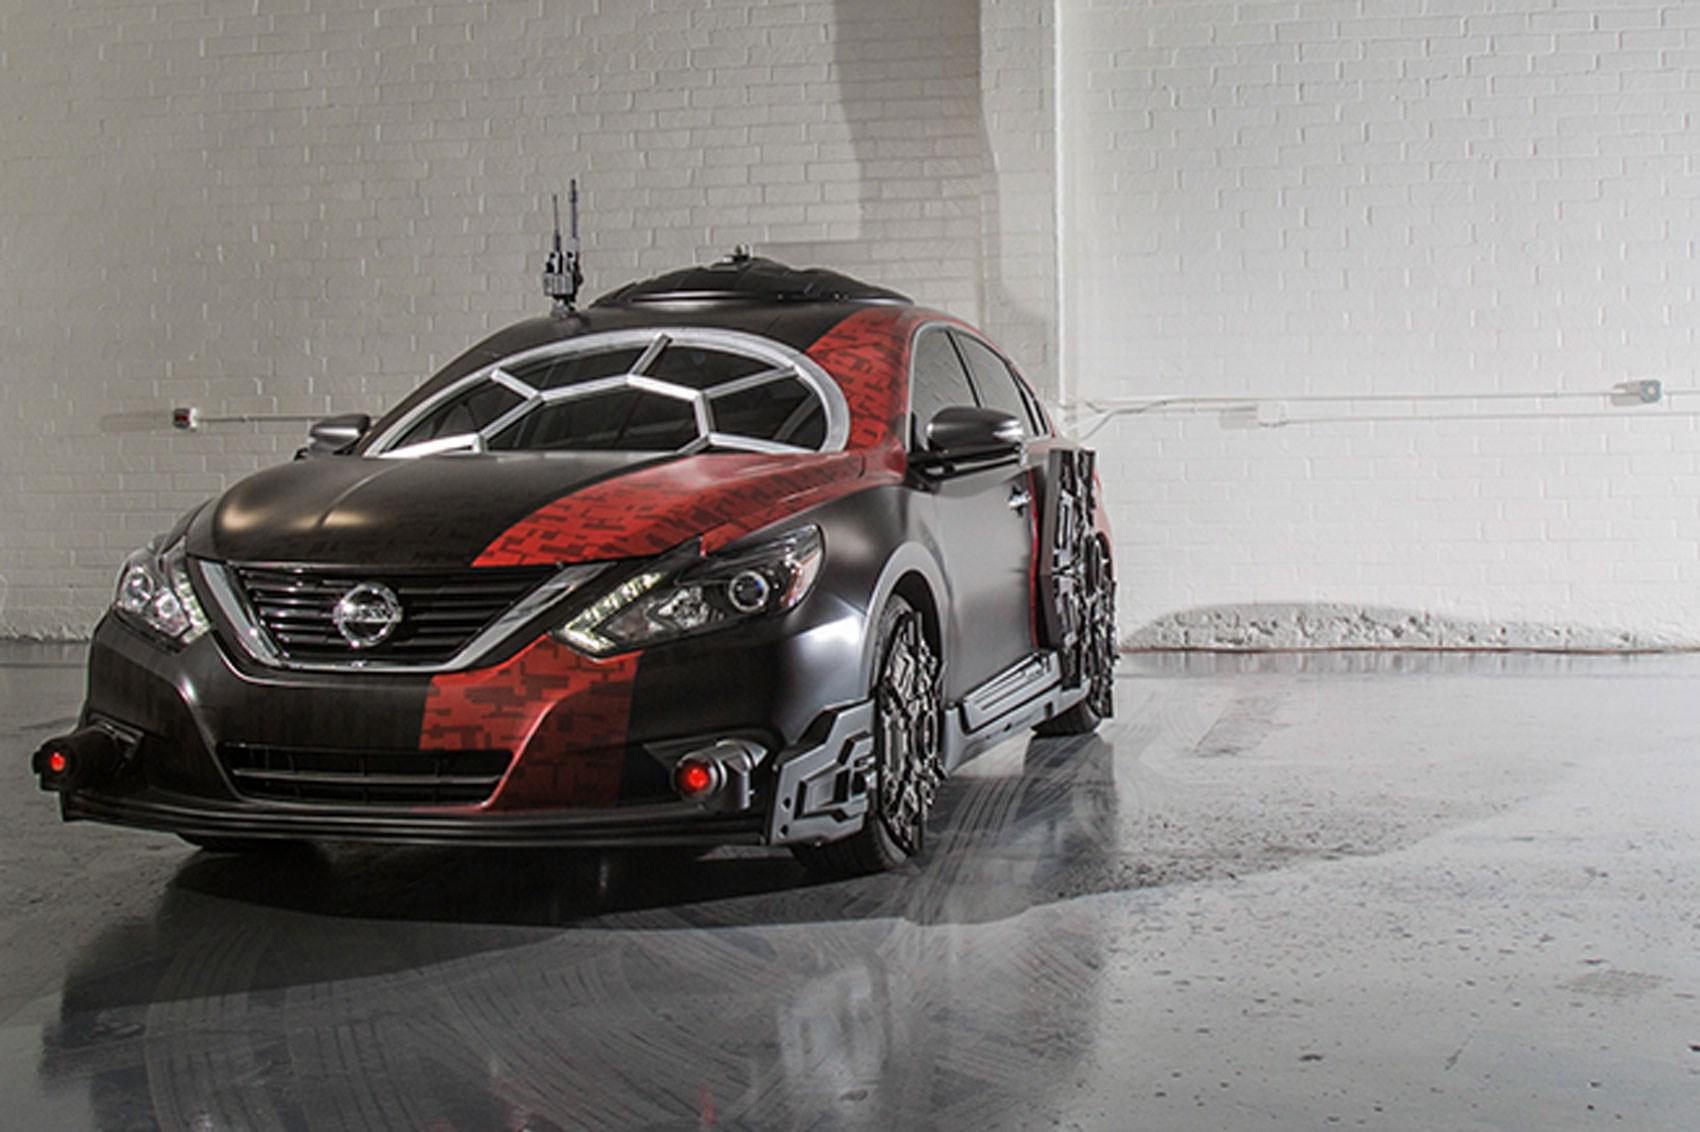 Car Wars: Gallery: Nissan's Bizarre Star Wars Tribute Cars At 2017